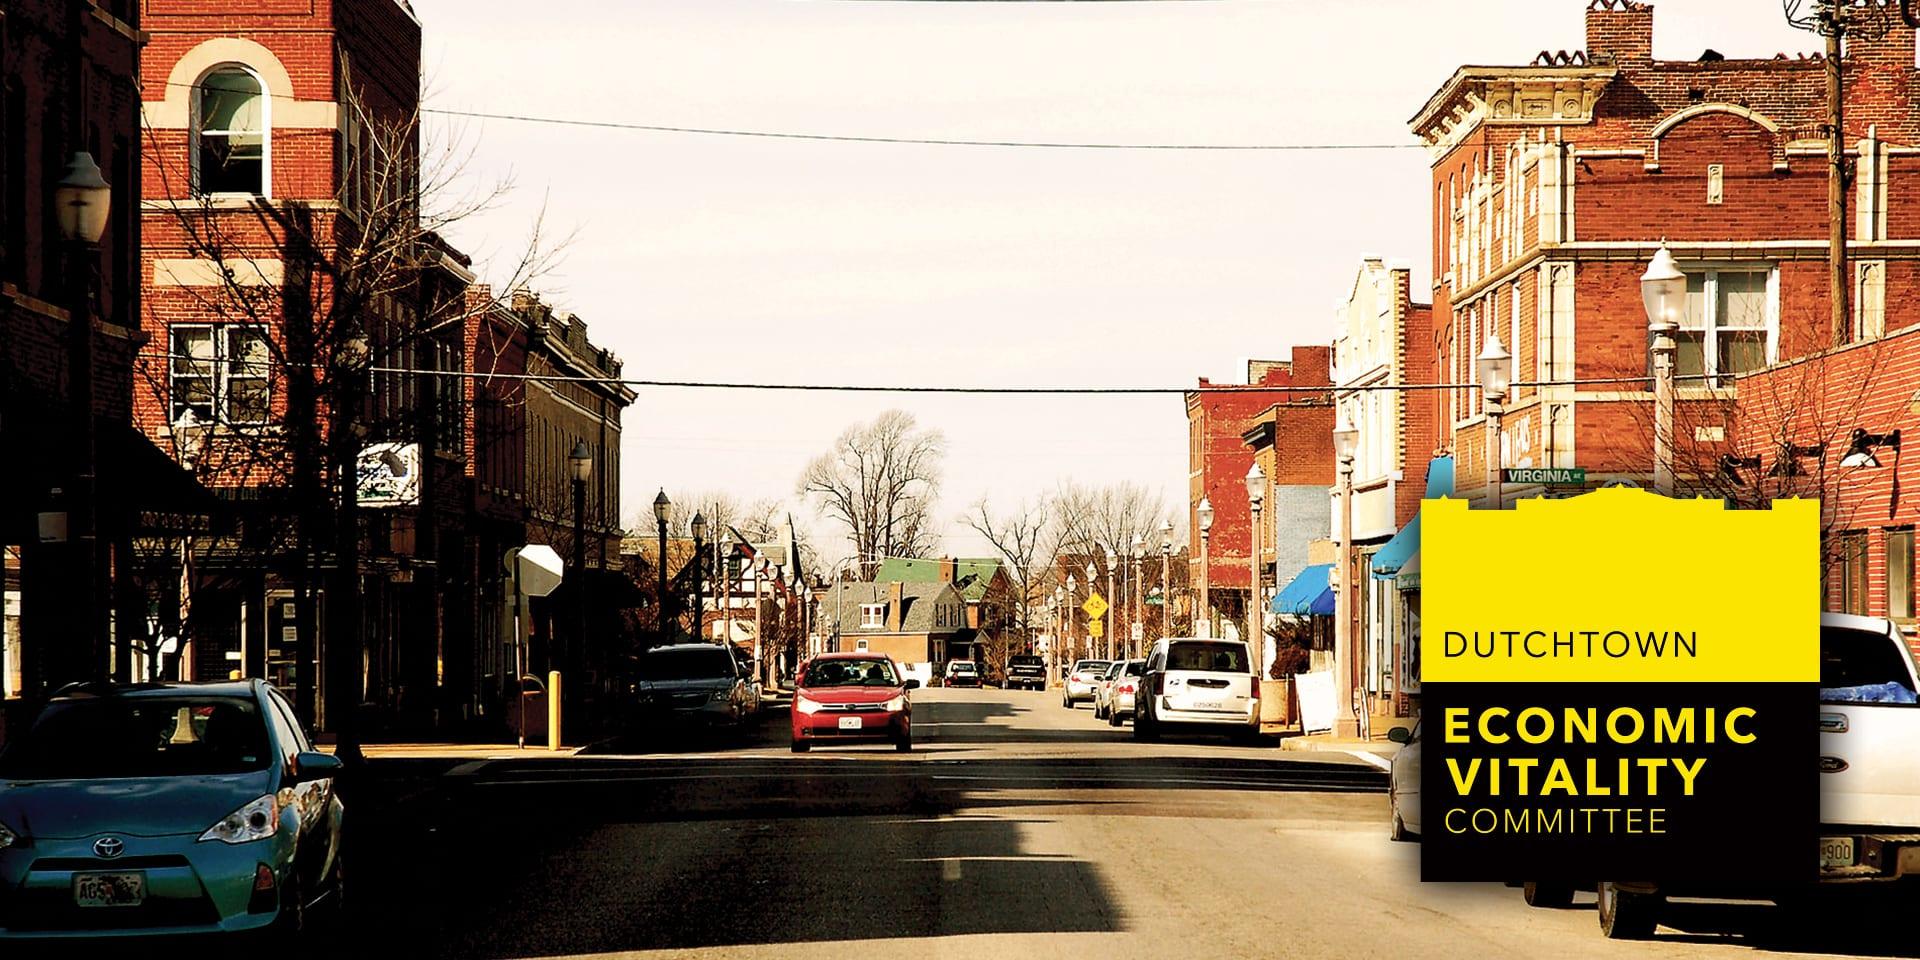 Dutchtown Economic Vitality Committee